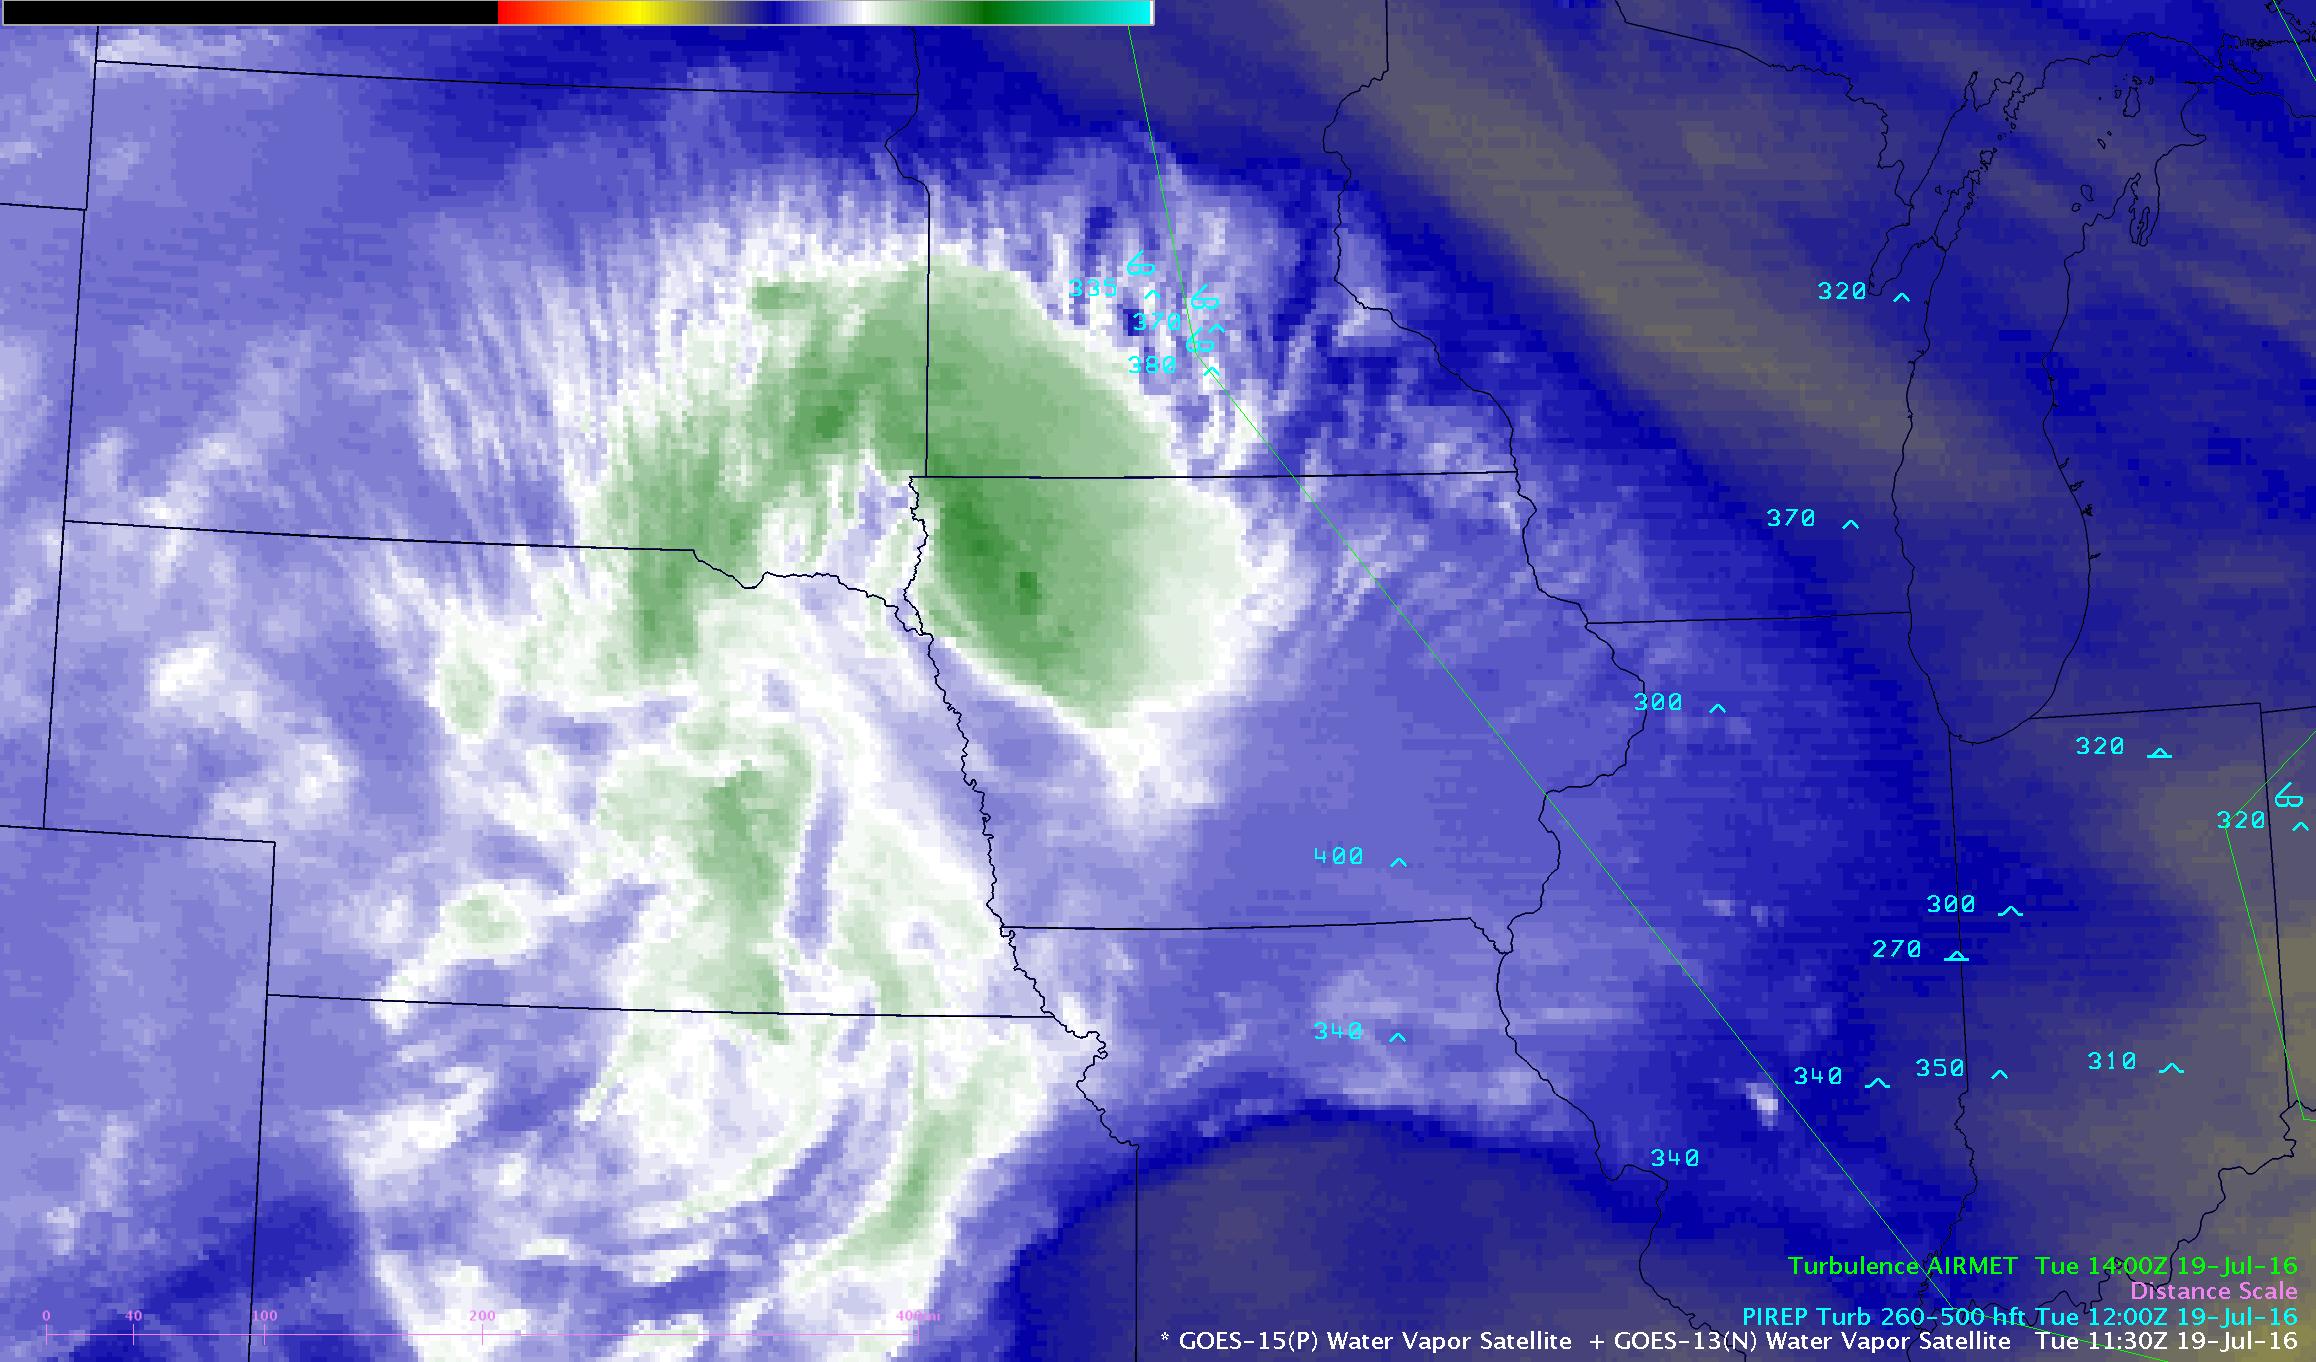 GOES-13 Water Vapor (6.5 um) images, pilot reports of turbulence, Turbulence AIRMET boundaries [click to play animation]